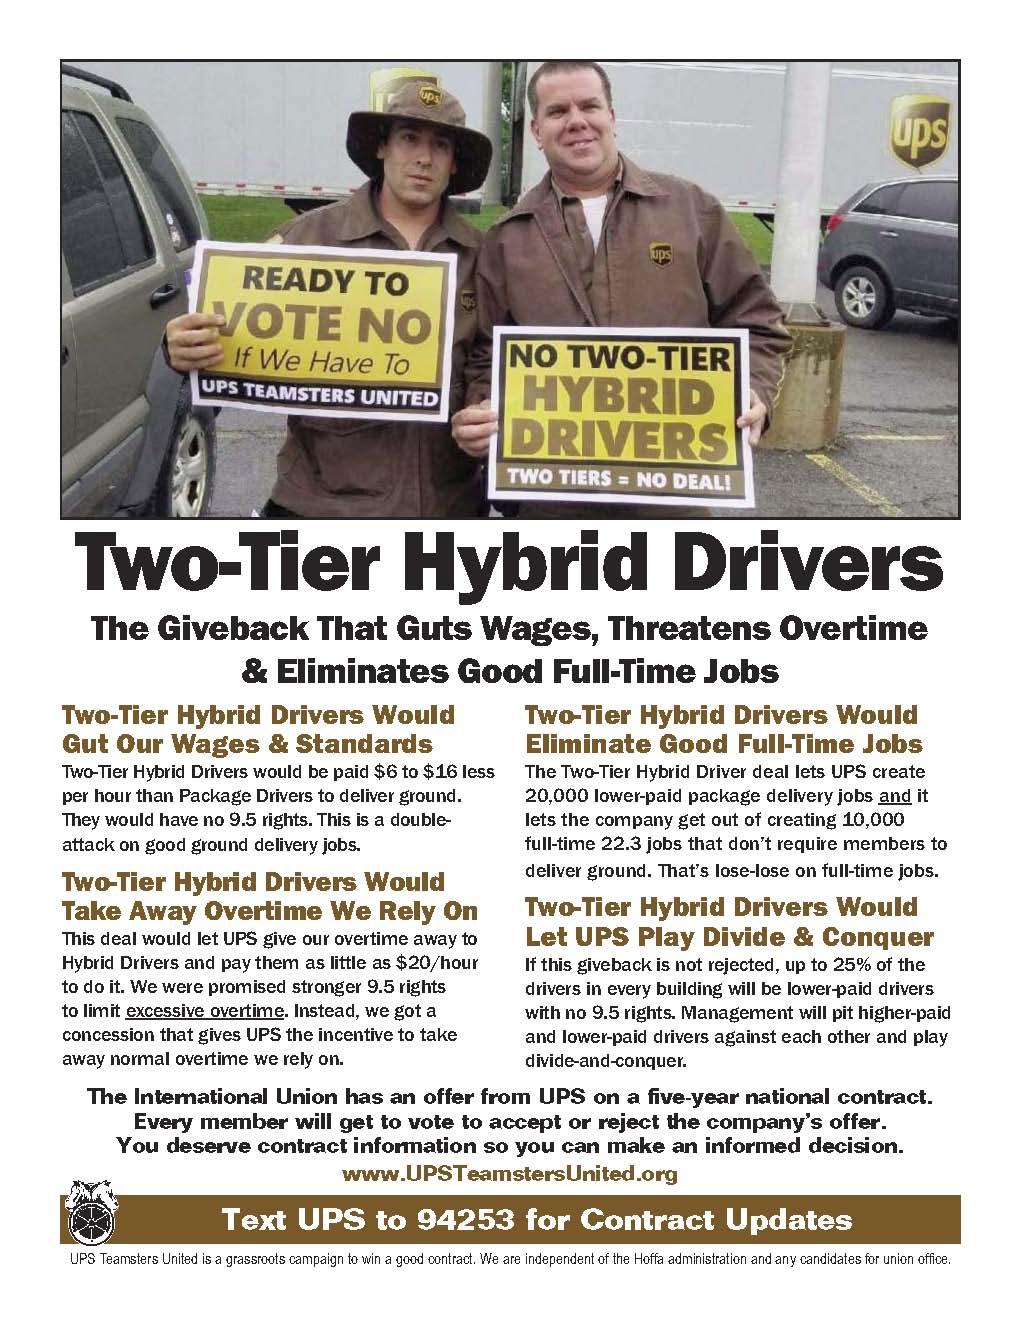 Hybrid-Drivers-Guts-Wages-Threaten-Overtime-Eliminate-FTJobs.jpg